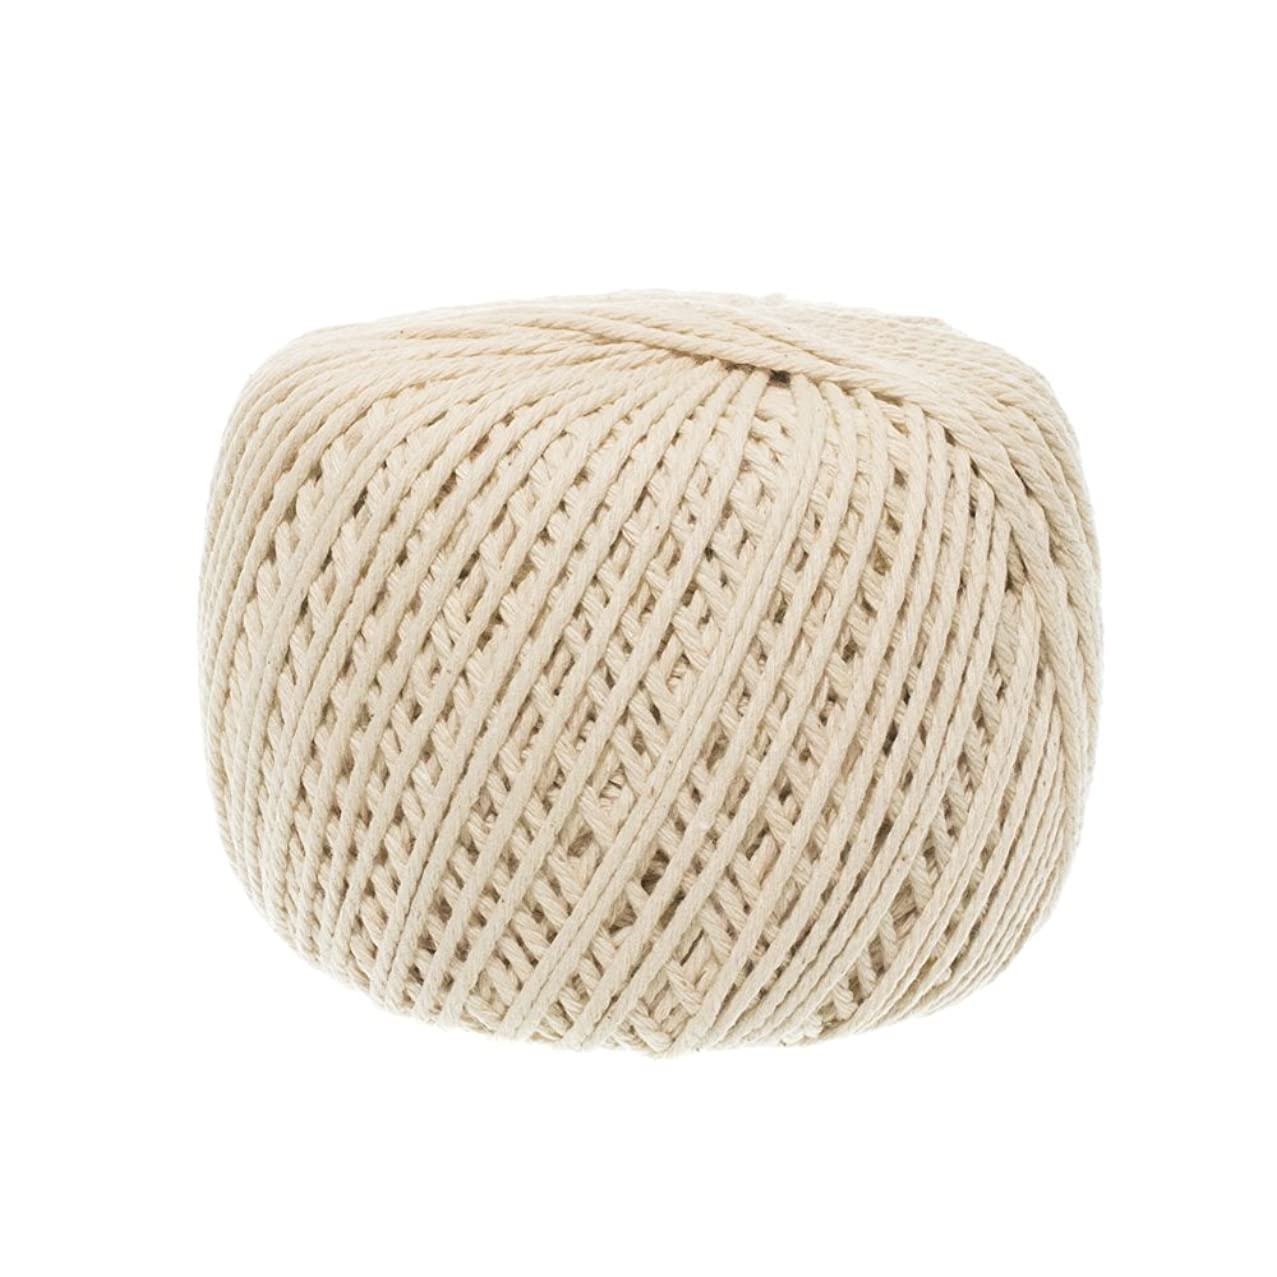 Macramé Cord 2 mm x 200 meters (about 218 yards) Handmade Decorations Natural Virgin Cotton Plant Hanger Macramé Wall Hangings Crocheting Bohemia Dream Catcher DIY Craft Knitting – Soft String Natural